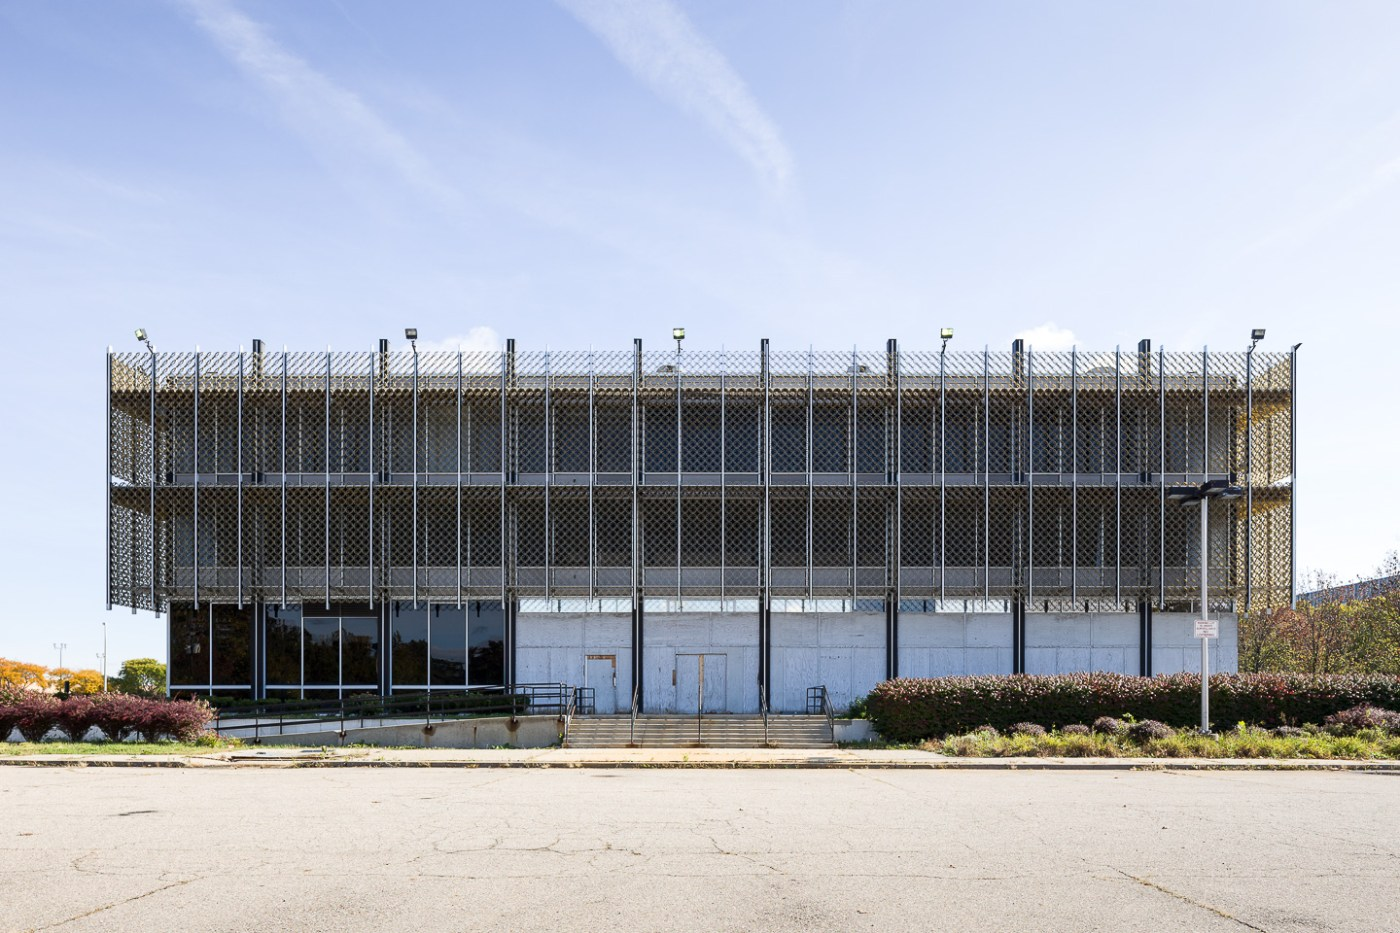 Exterior photograph of Reynolds Metals building in Detroit, Michigan by architect Minoru Yamasaki.